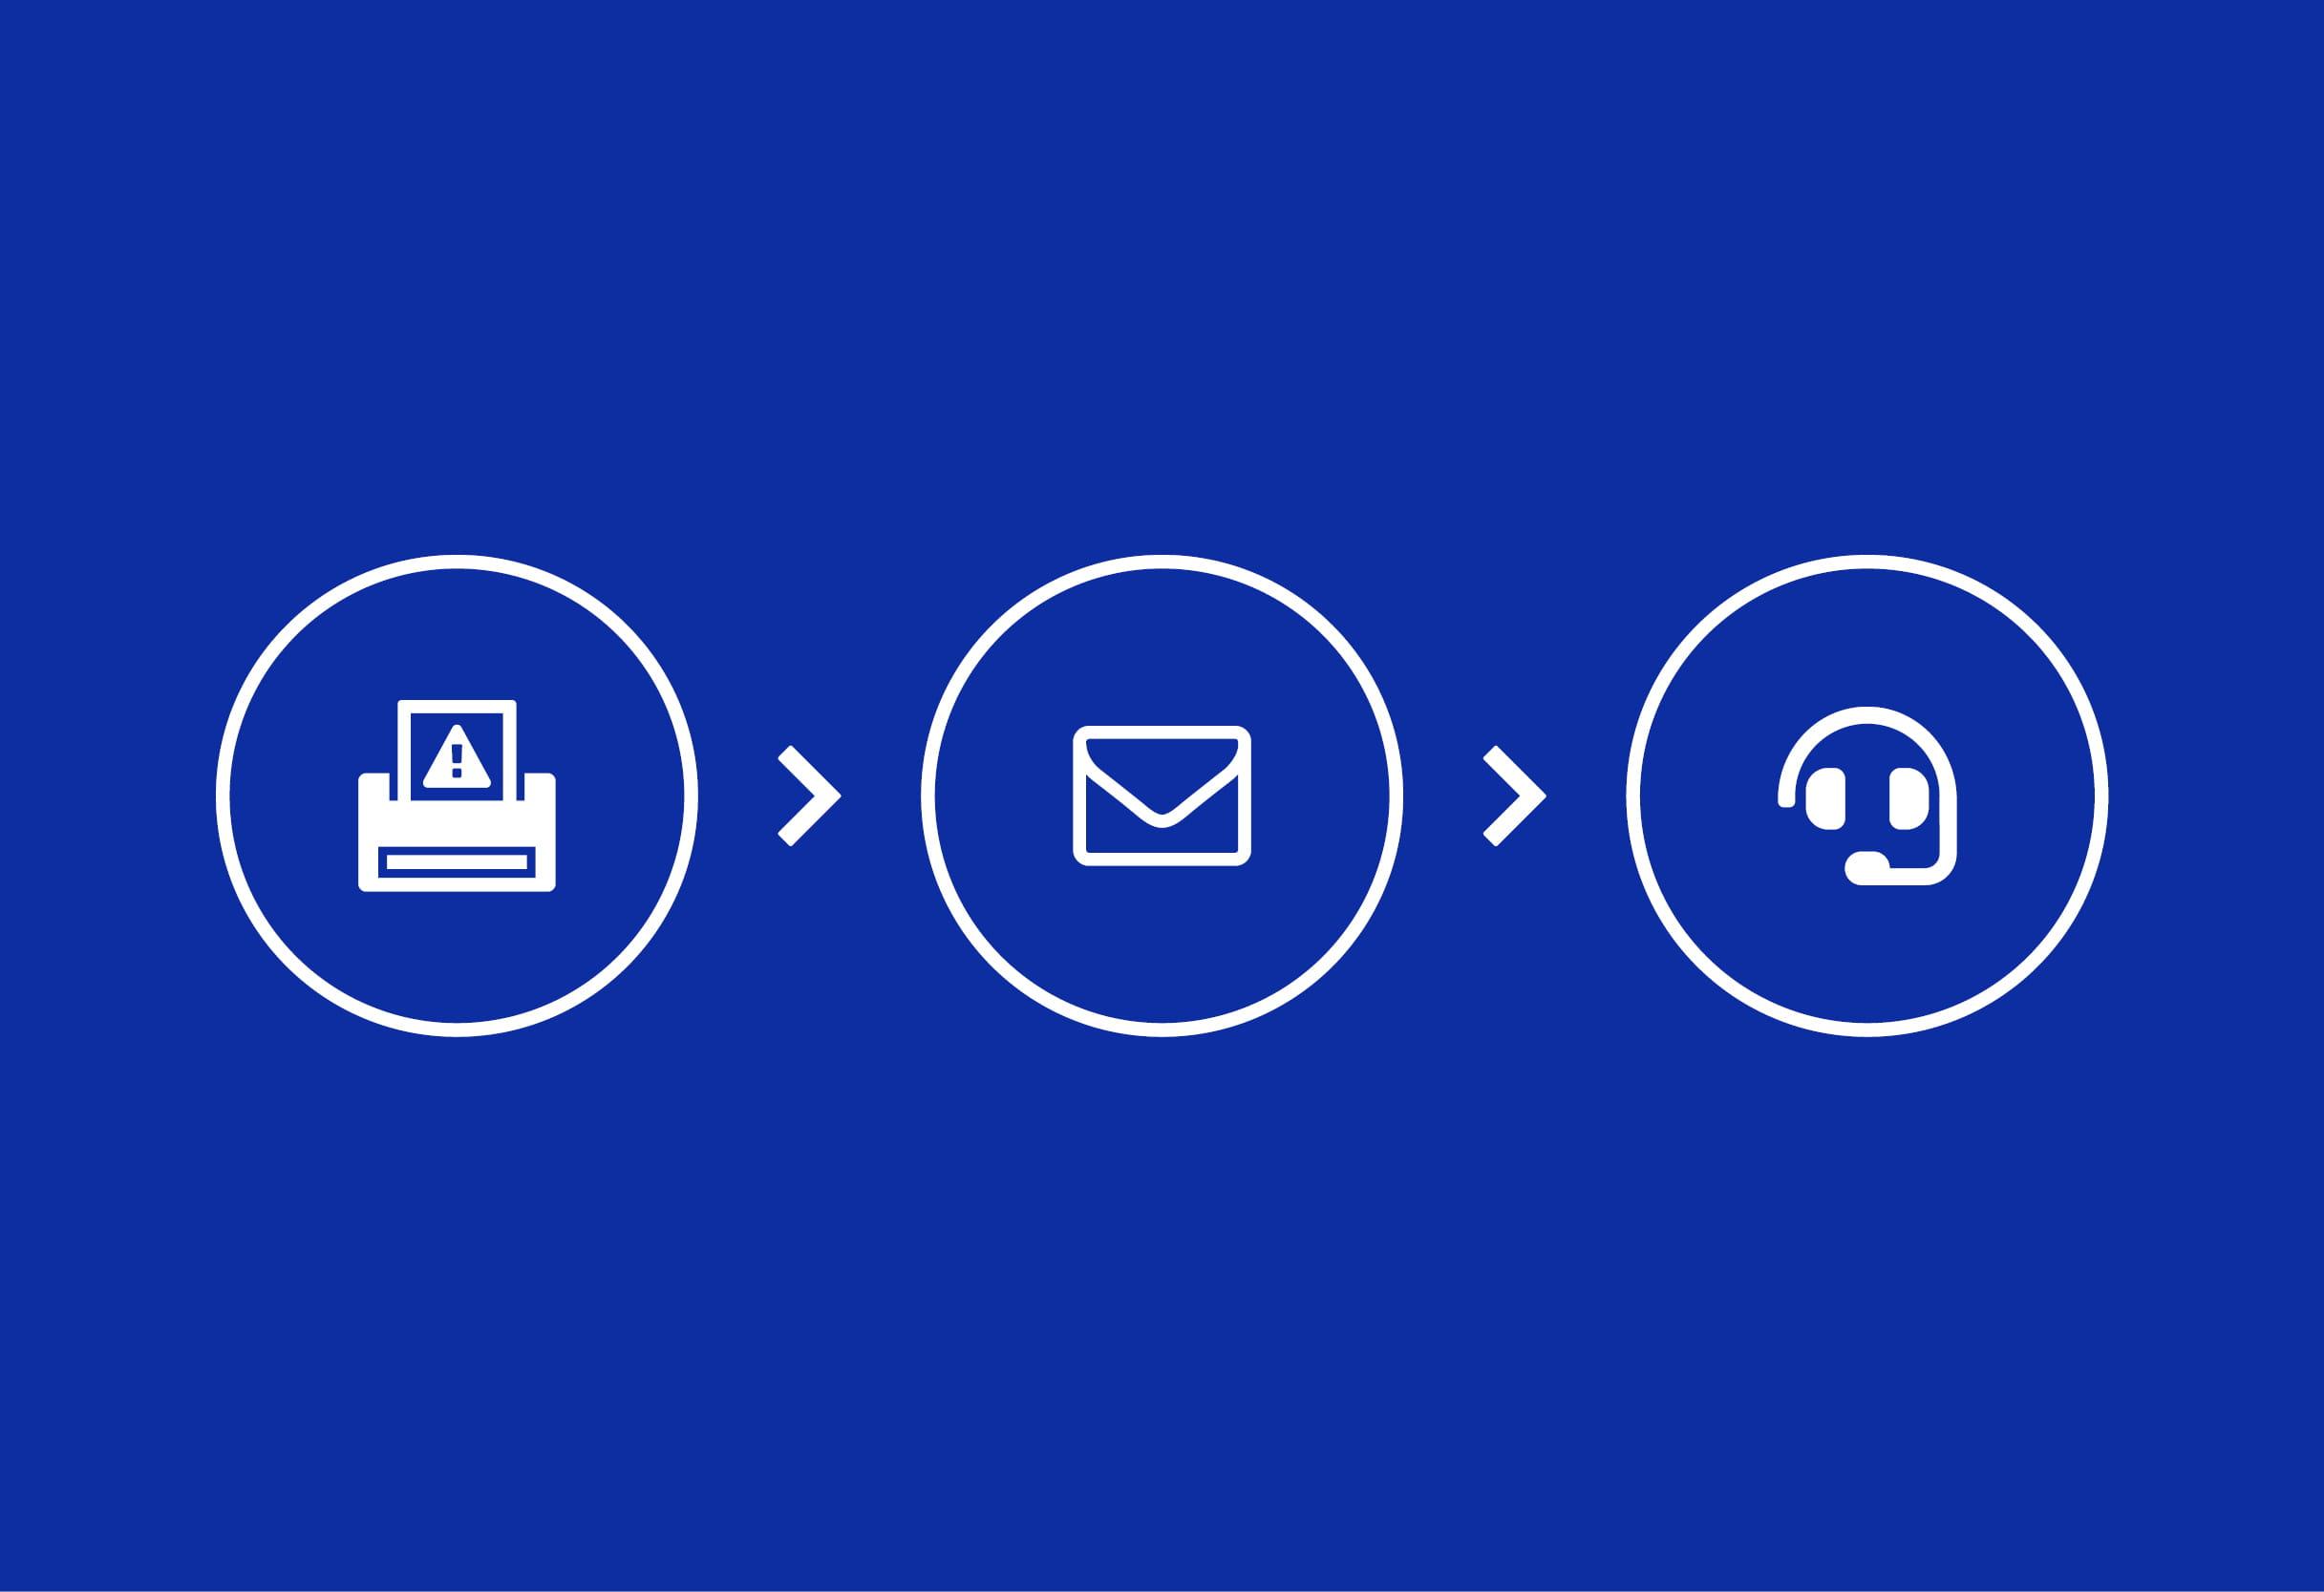 Ikona tiskalnika ikona e-pošte ikona ključa za matice